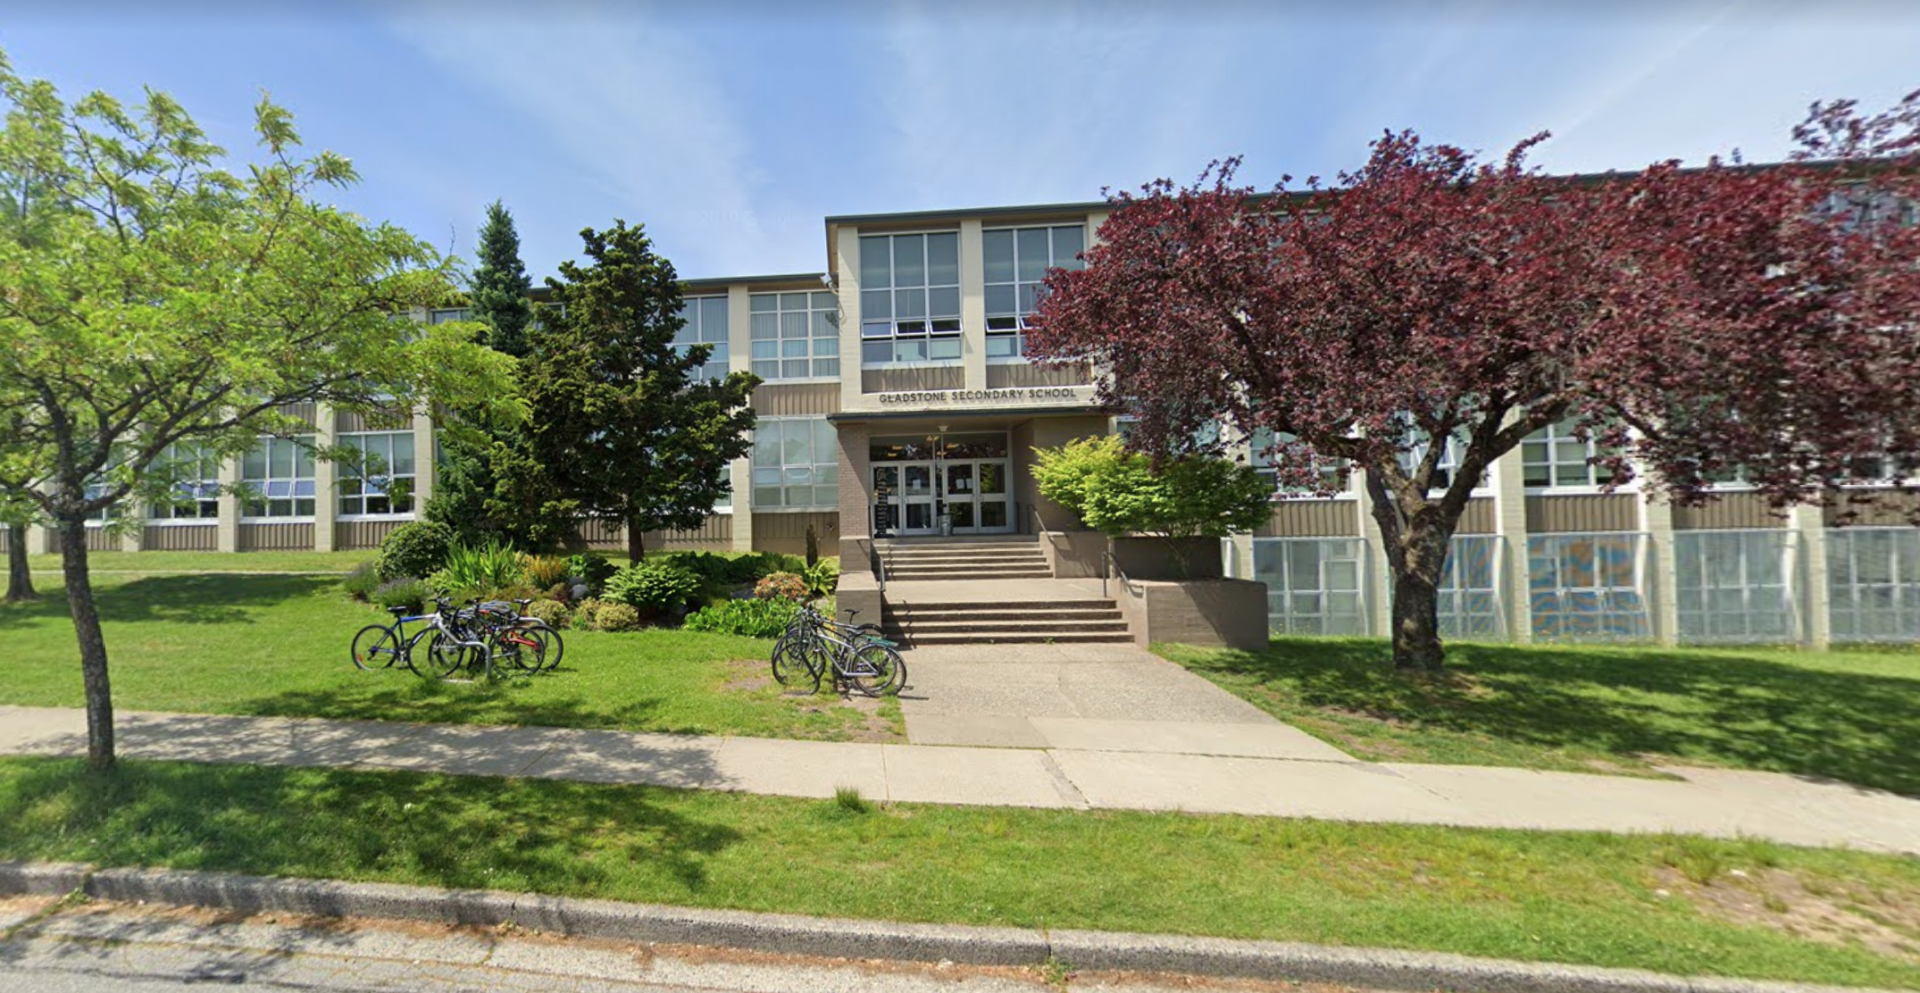 Coronavirus exposure identified at East Vancouver high school